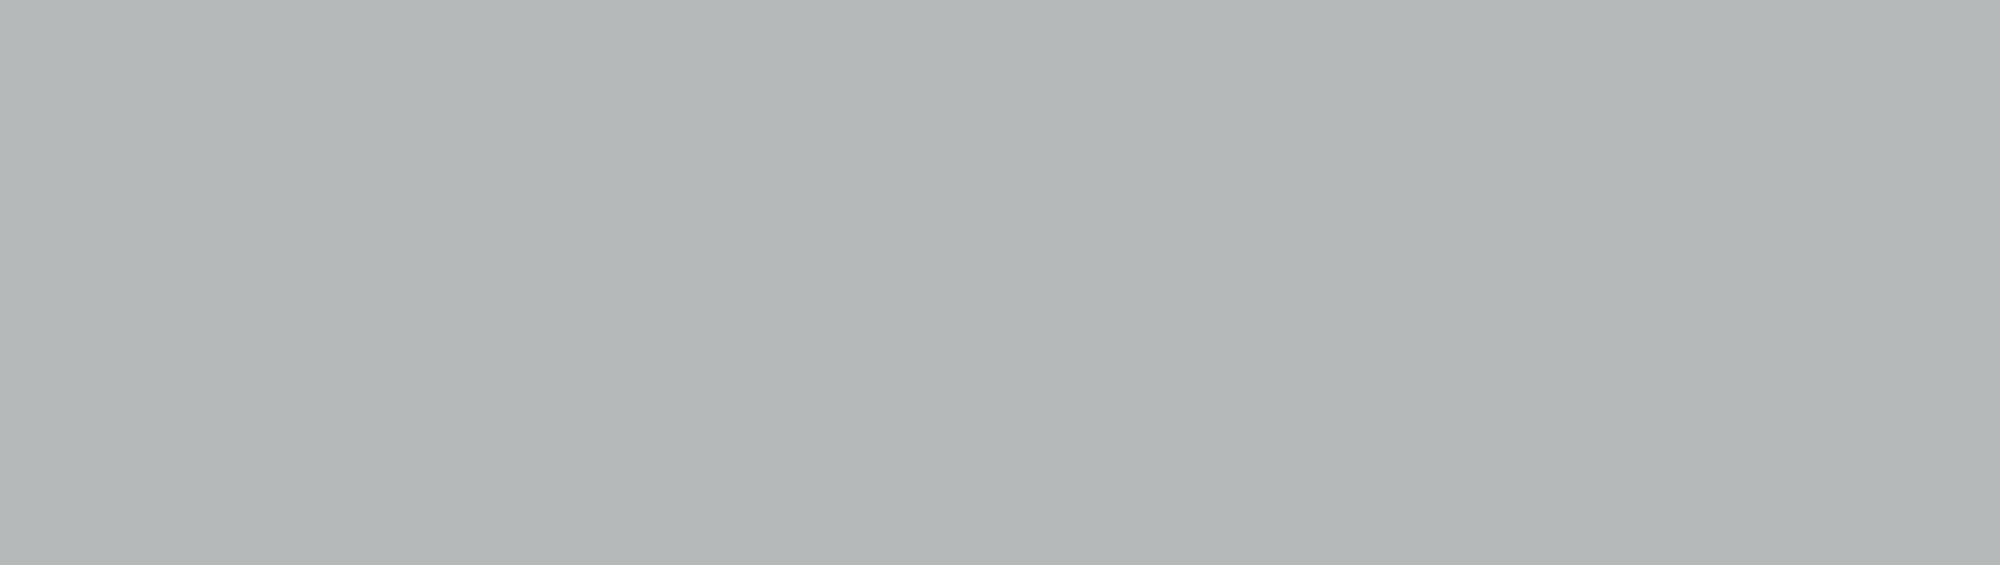 Vitro Biopharma Logo